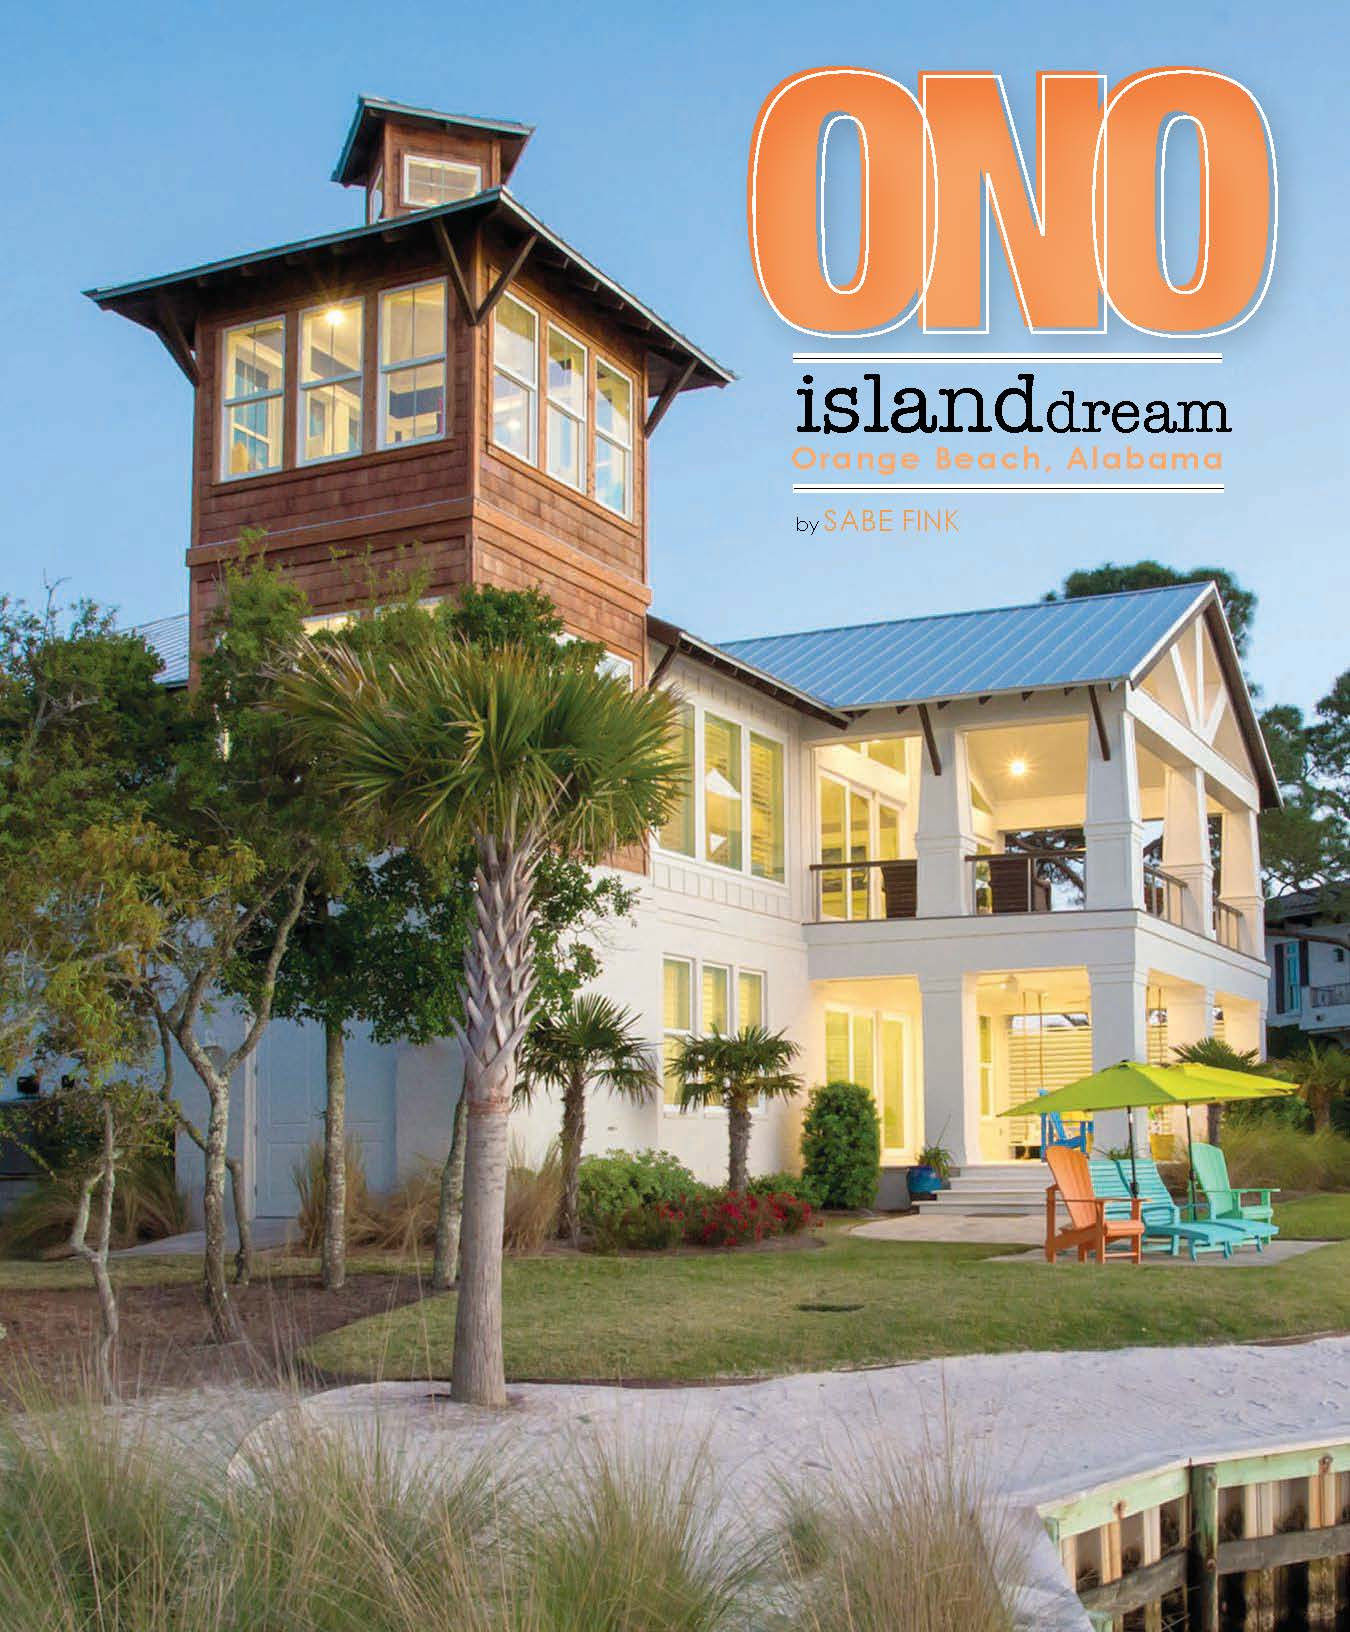 Ono Island Dream